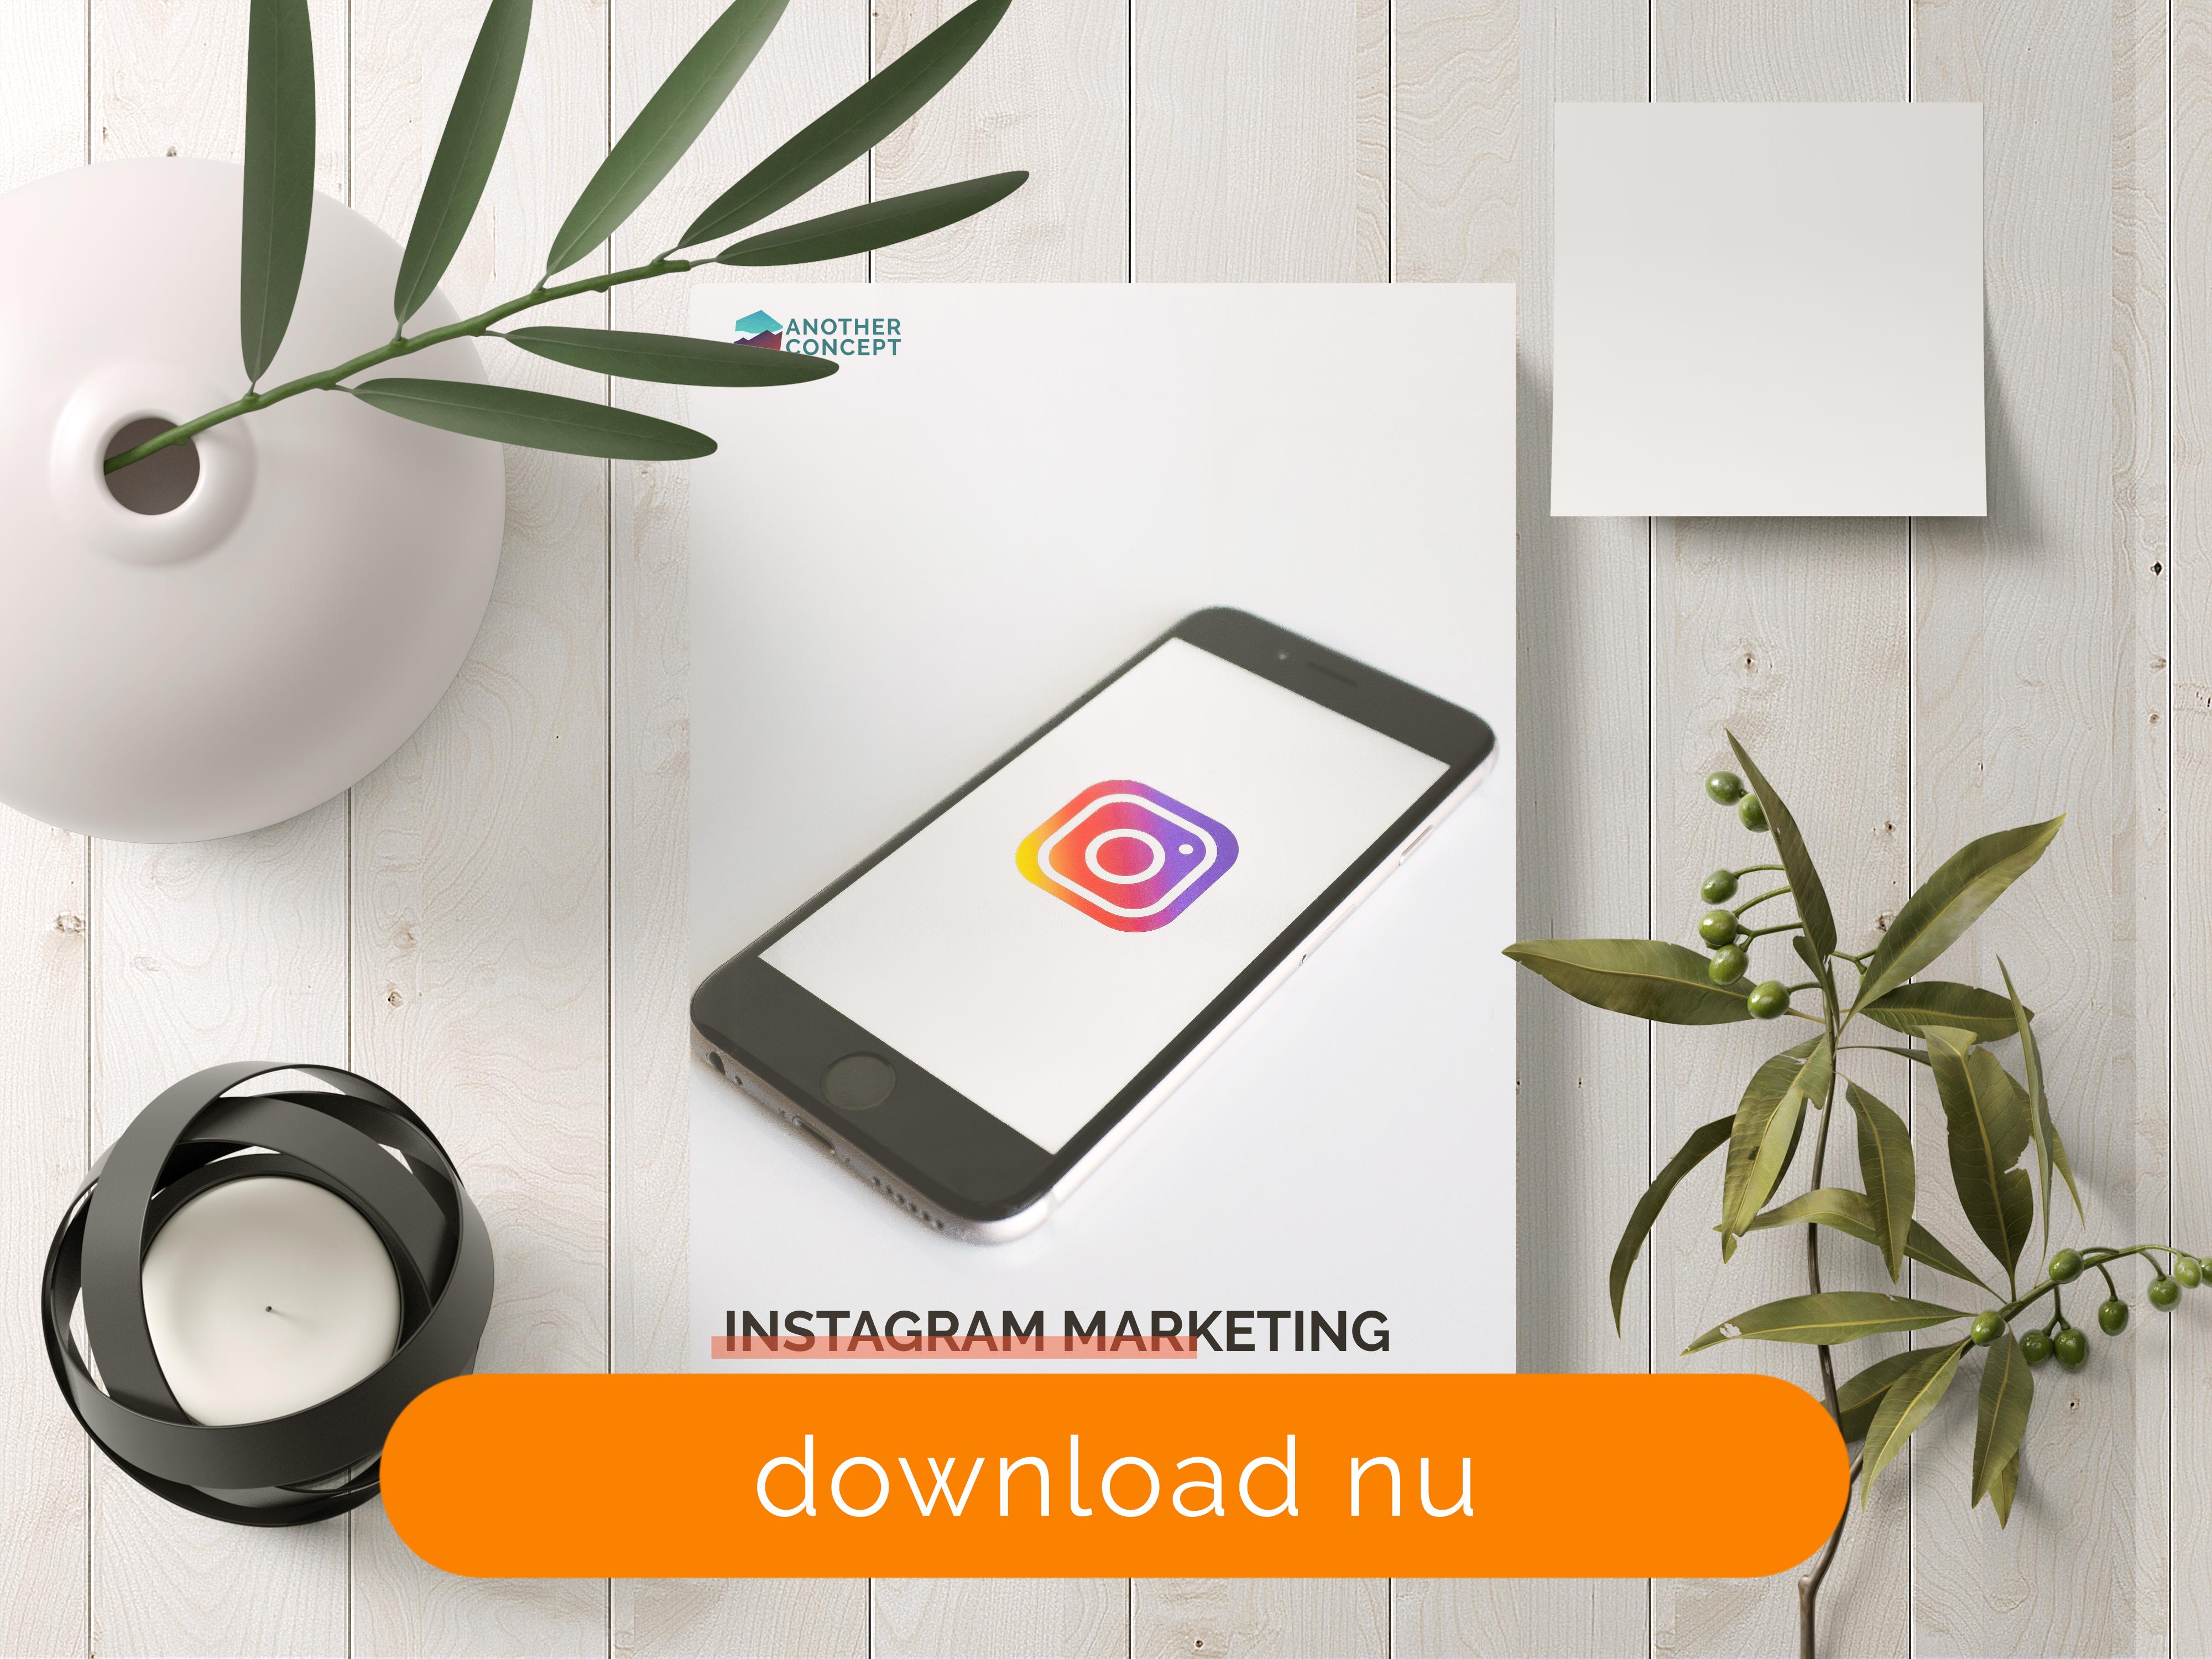 Instagram ebook - Another Concept